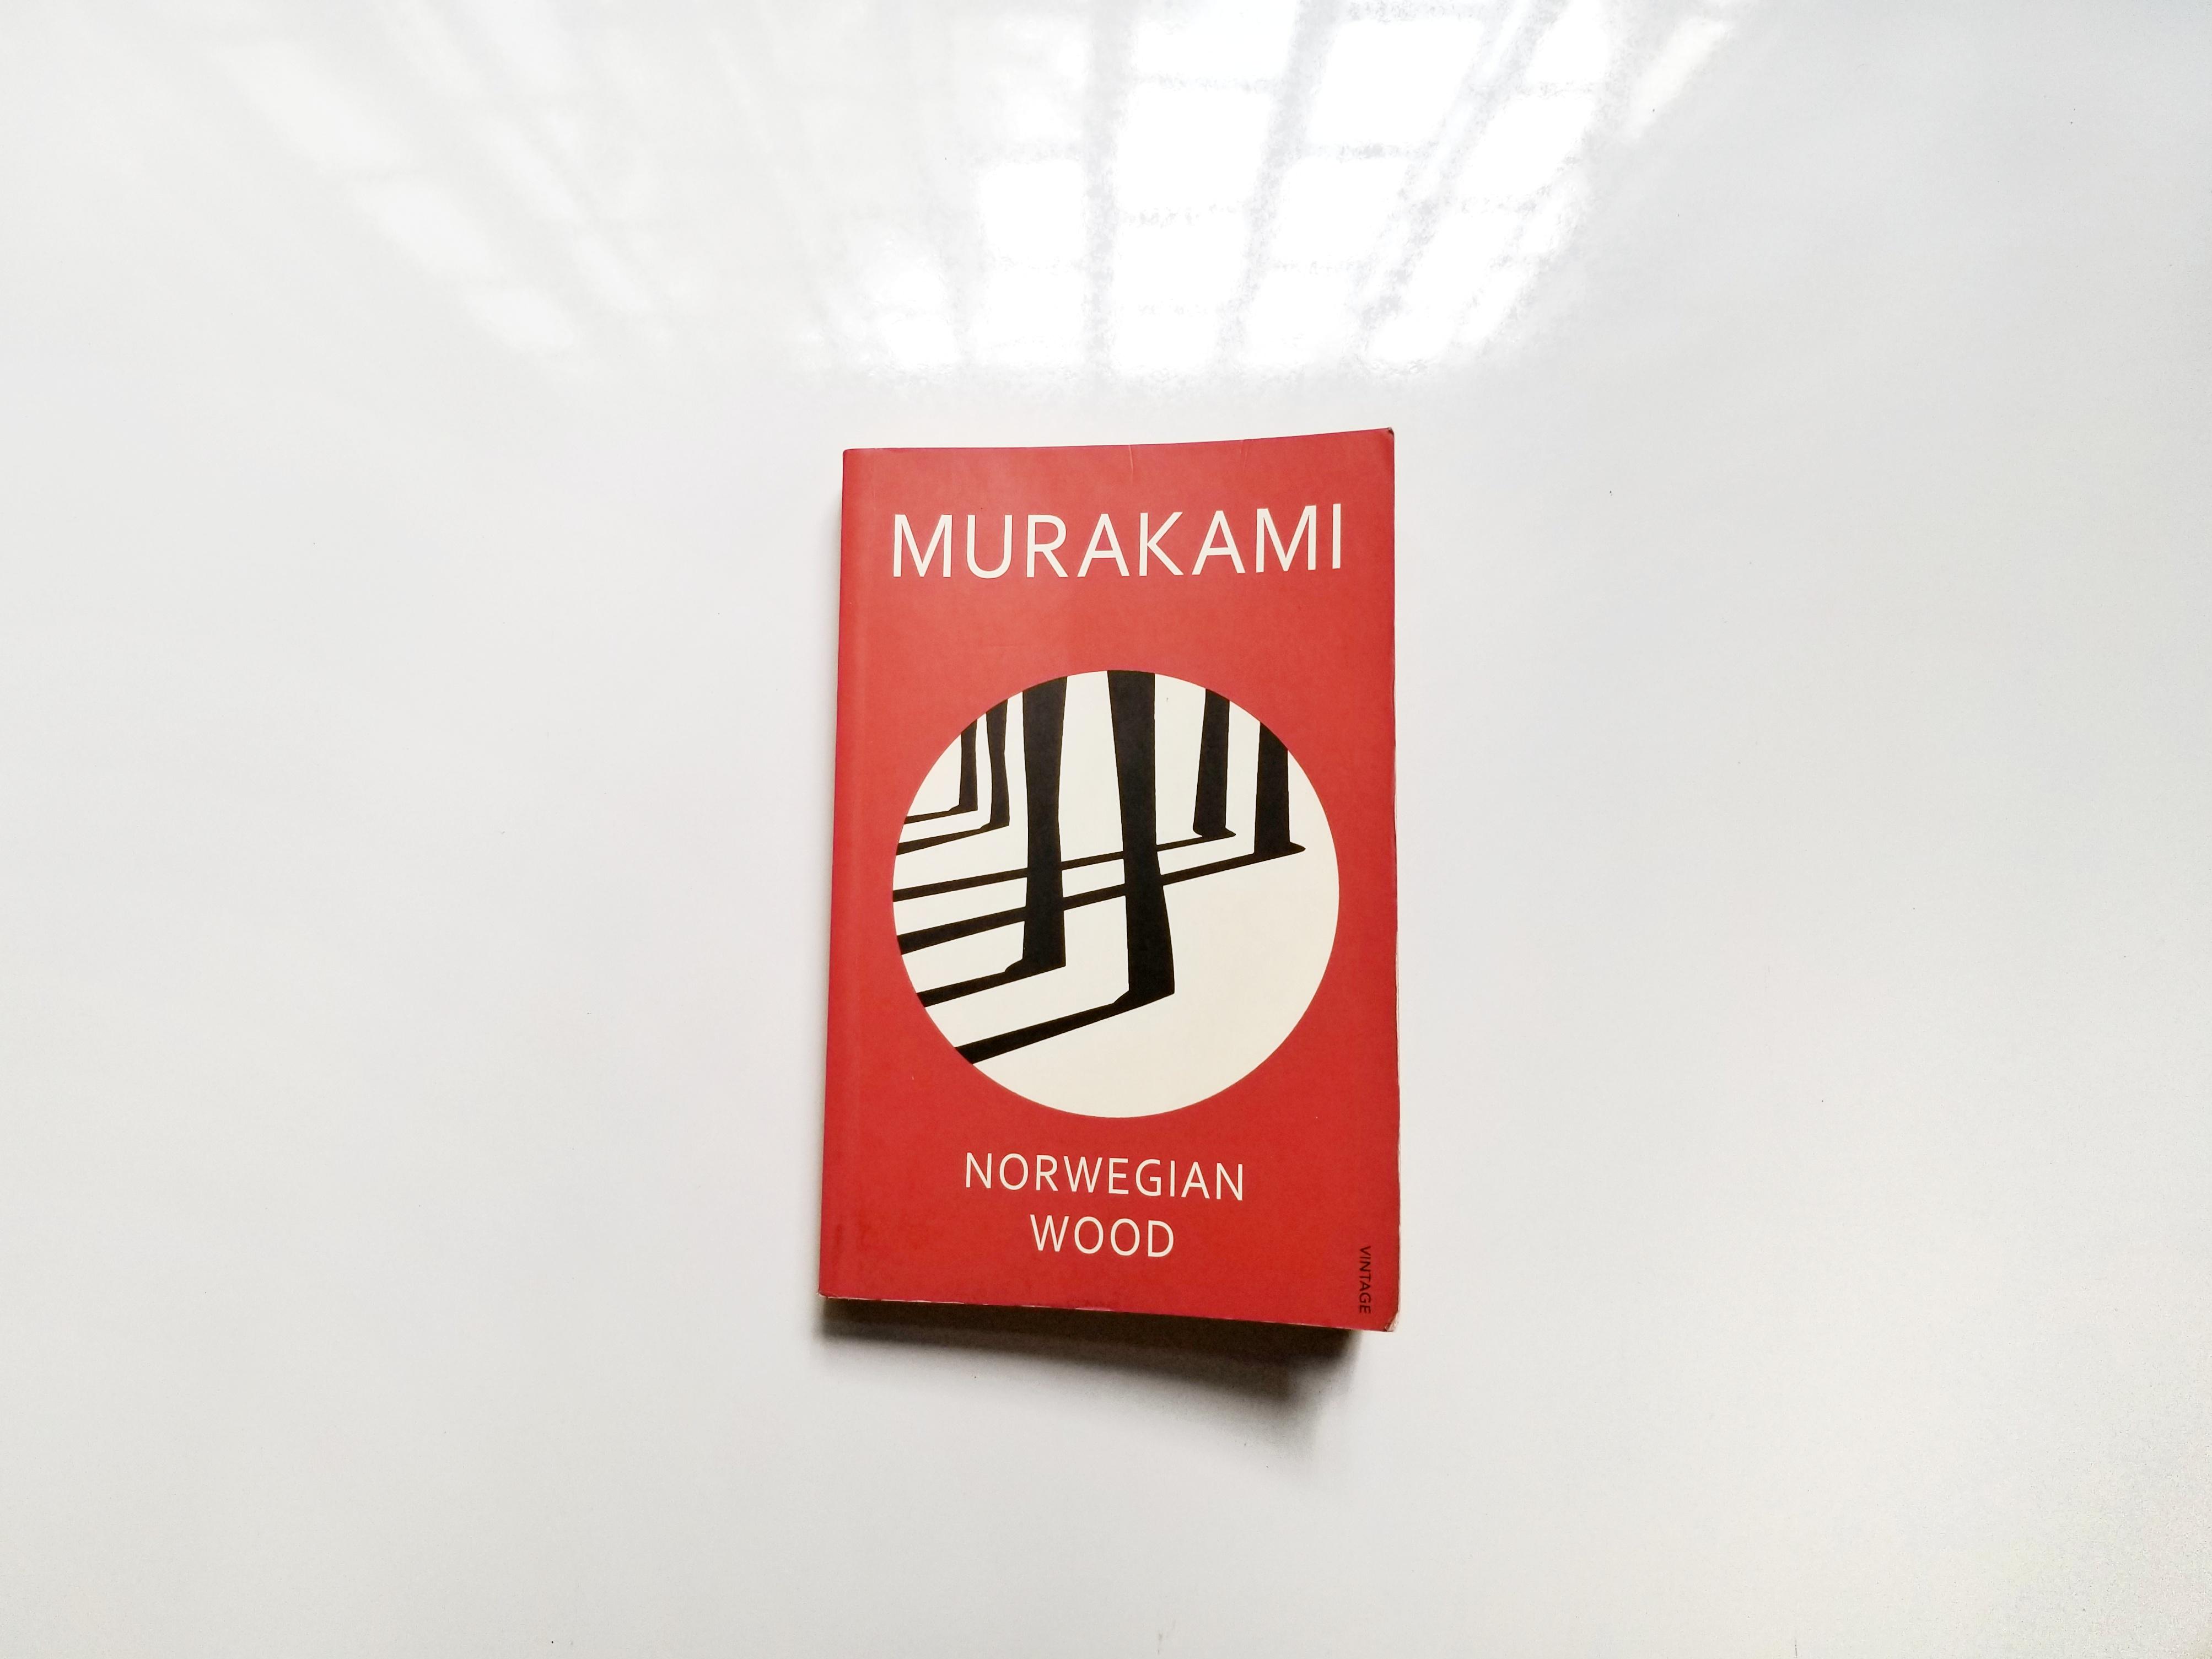 On Finding Strength in Simplicity and Simplicity in Strength: In Haruki Murakami's Norwegian Wood